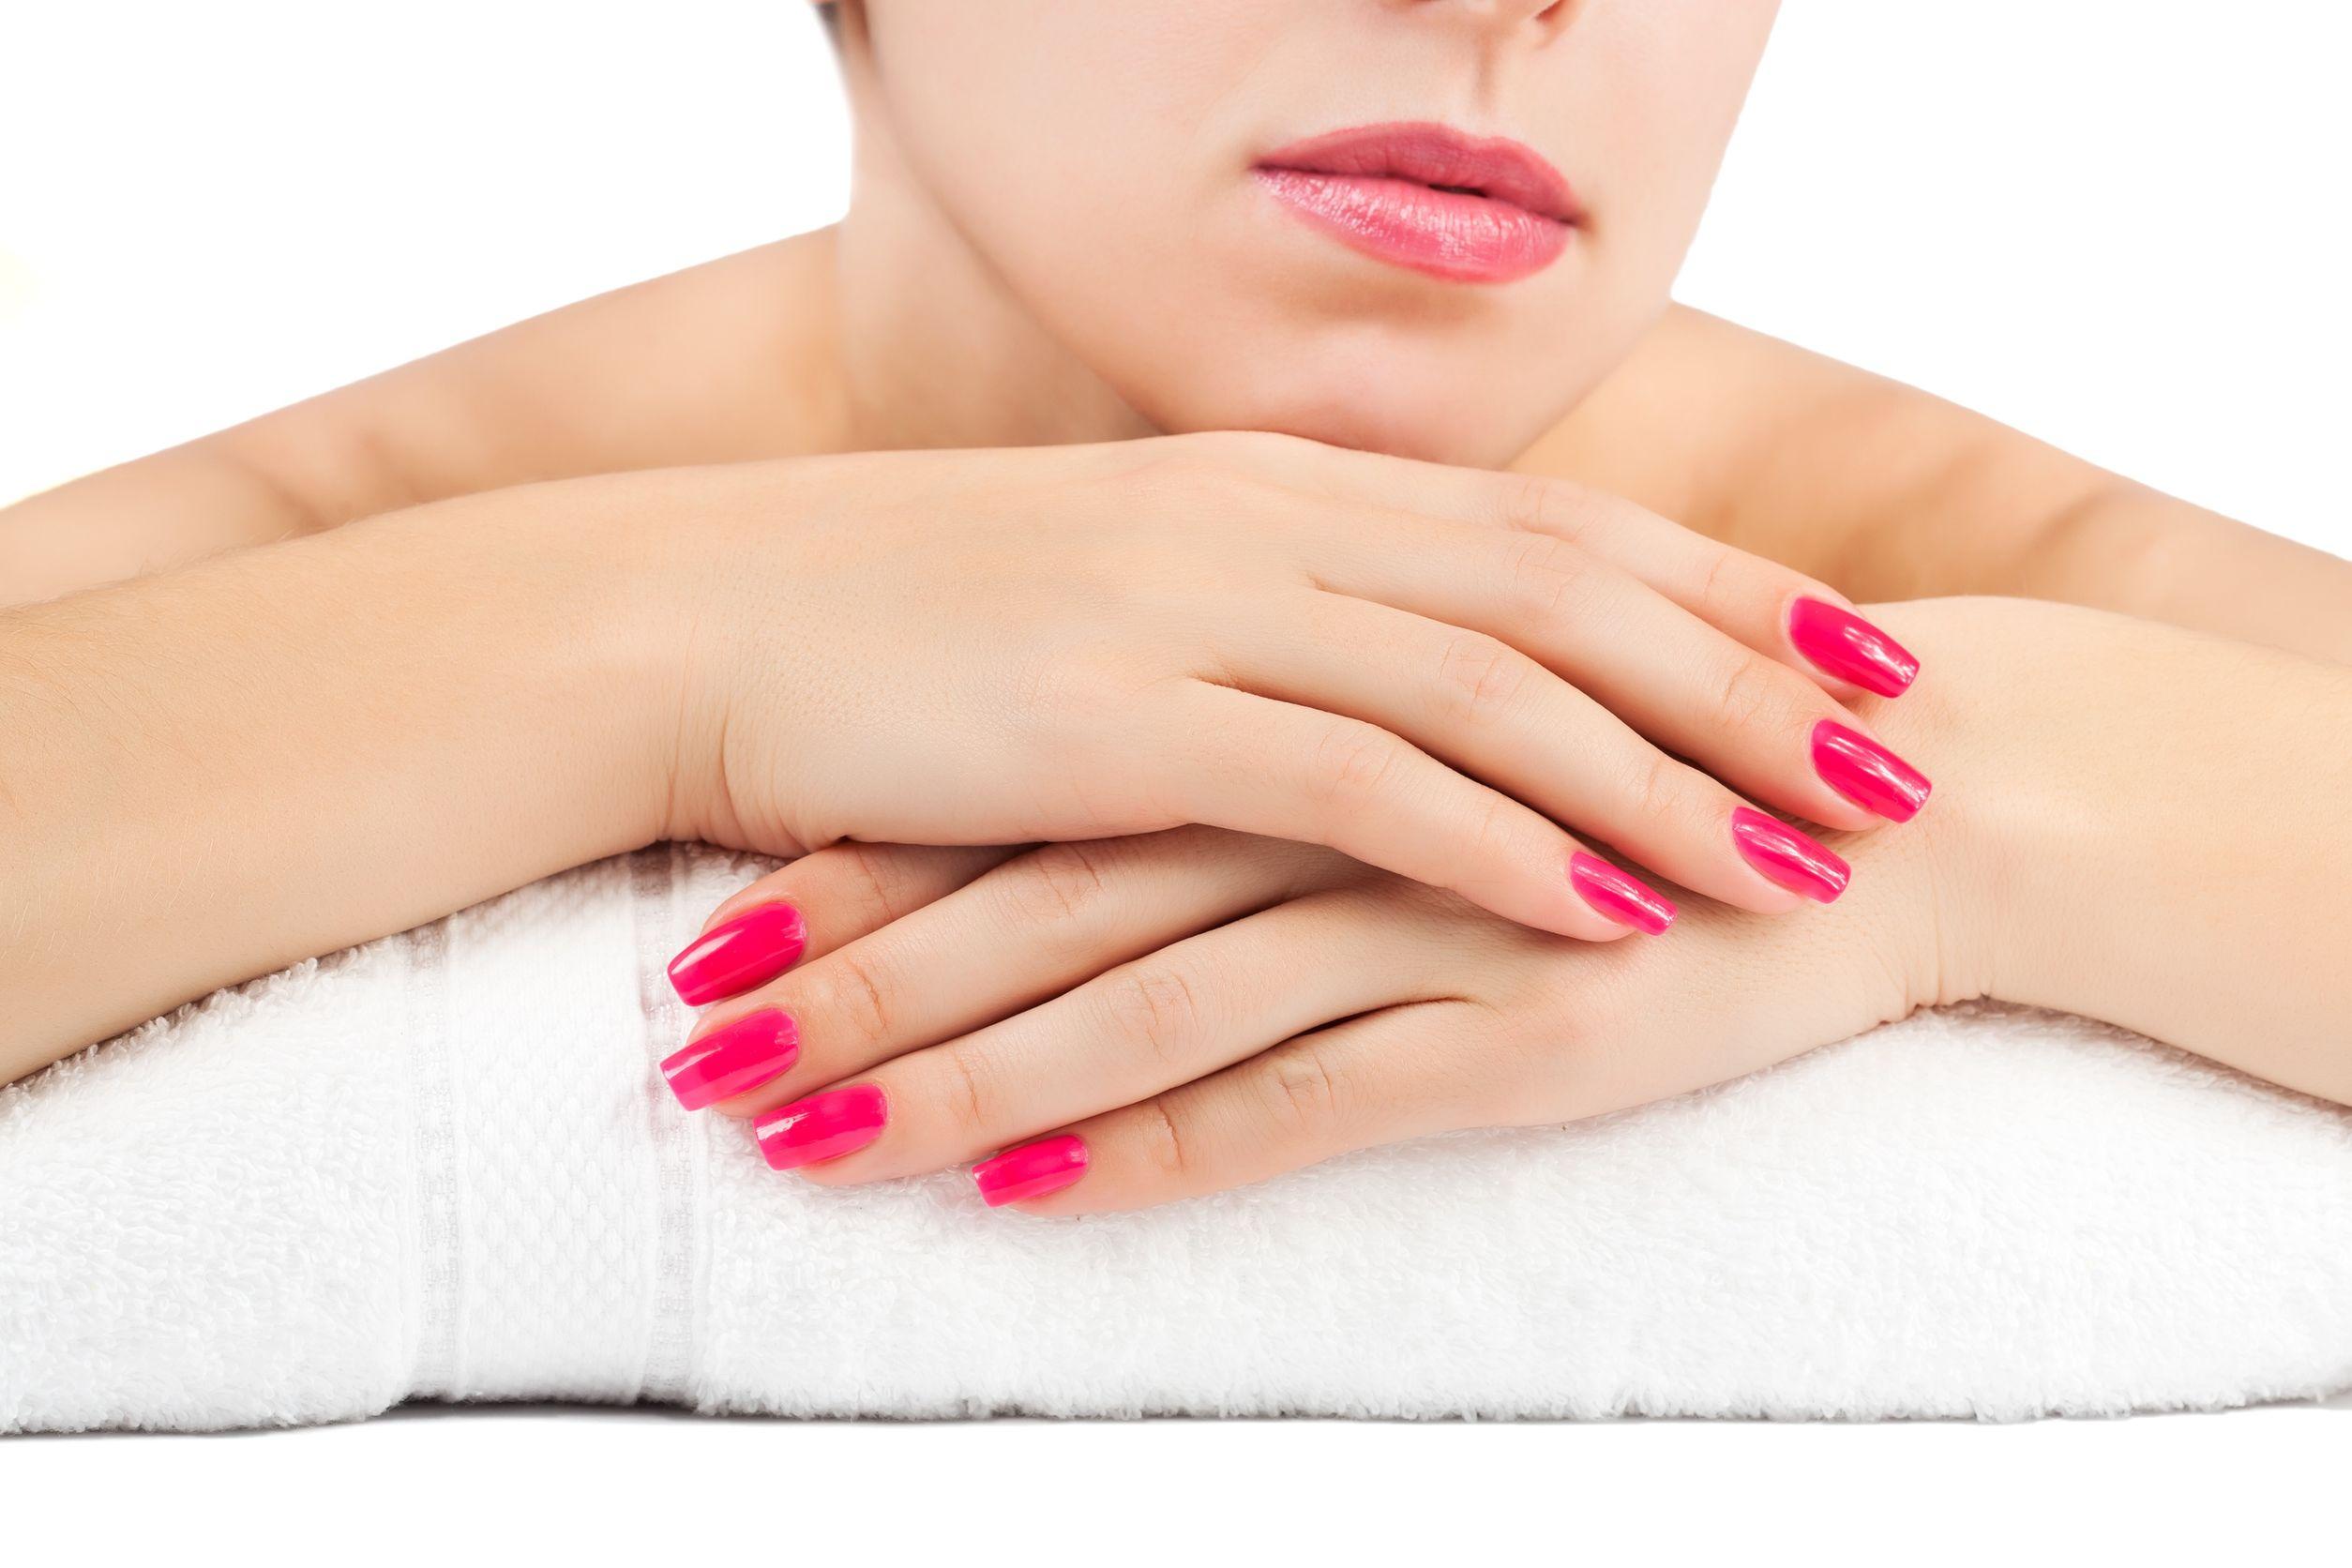 Frau mit lackierten Nägeln im spa salon